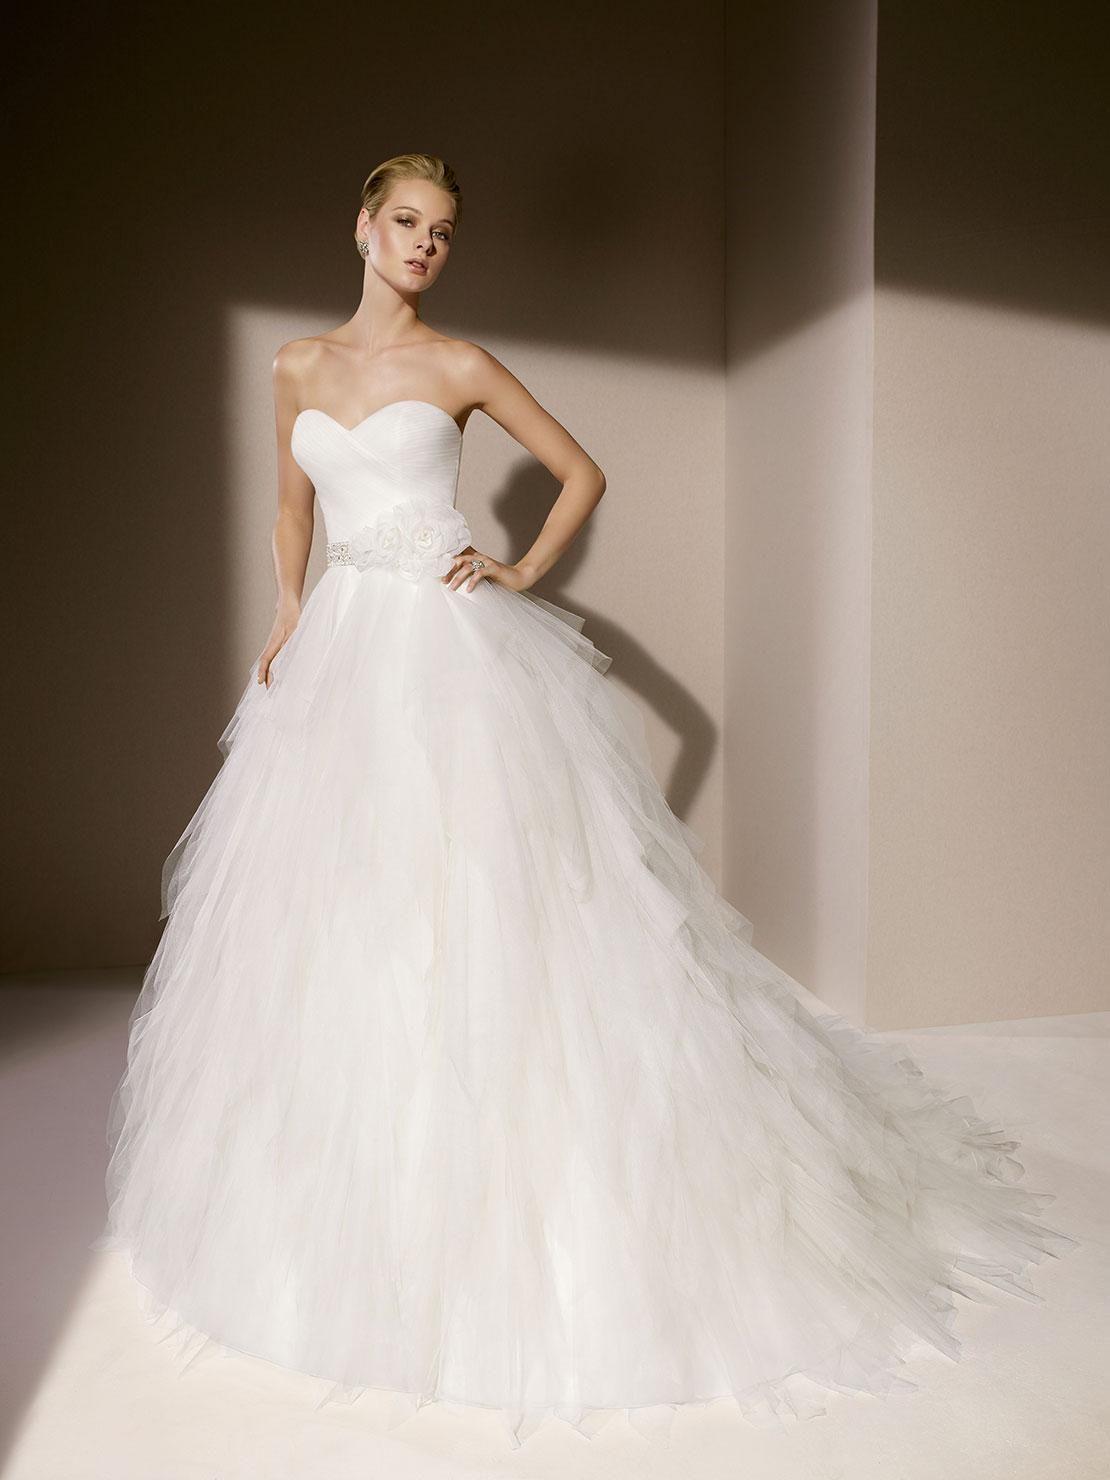 Elegant wedding dresses for mature brides   Wedding Gowns Sweetheart Neckline Ruffle Crystal Sash Handmade